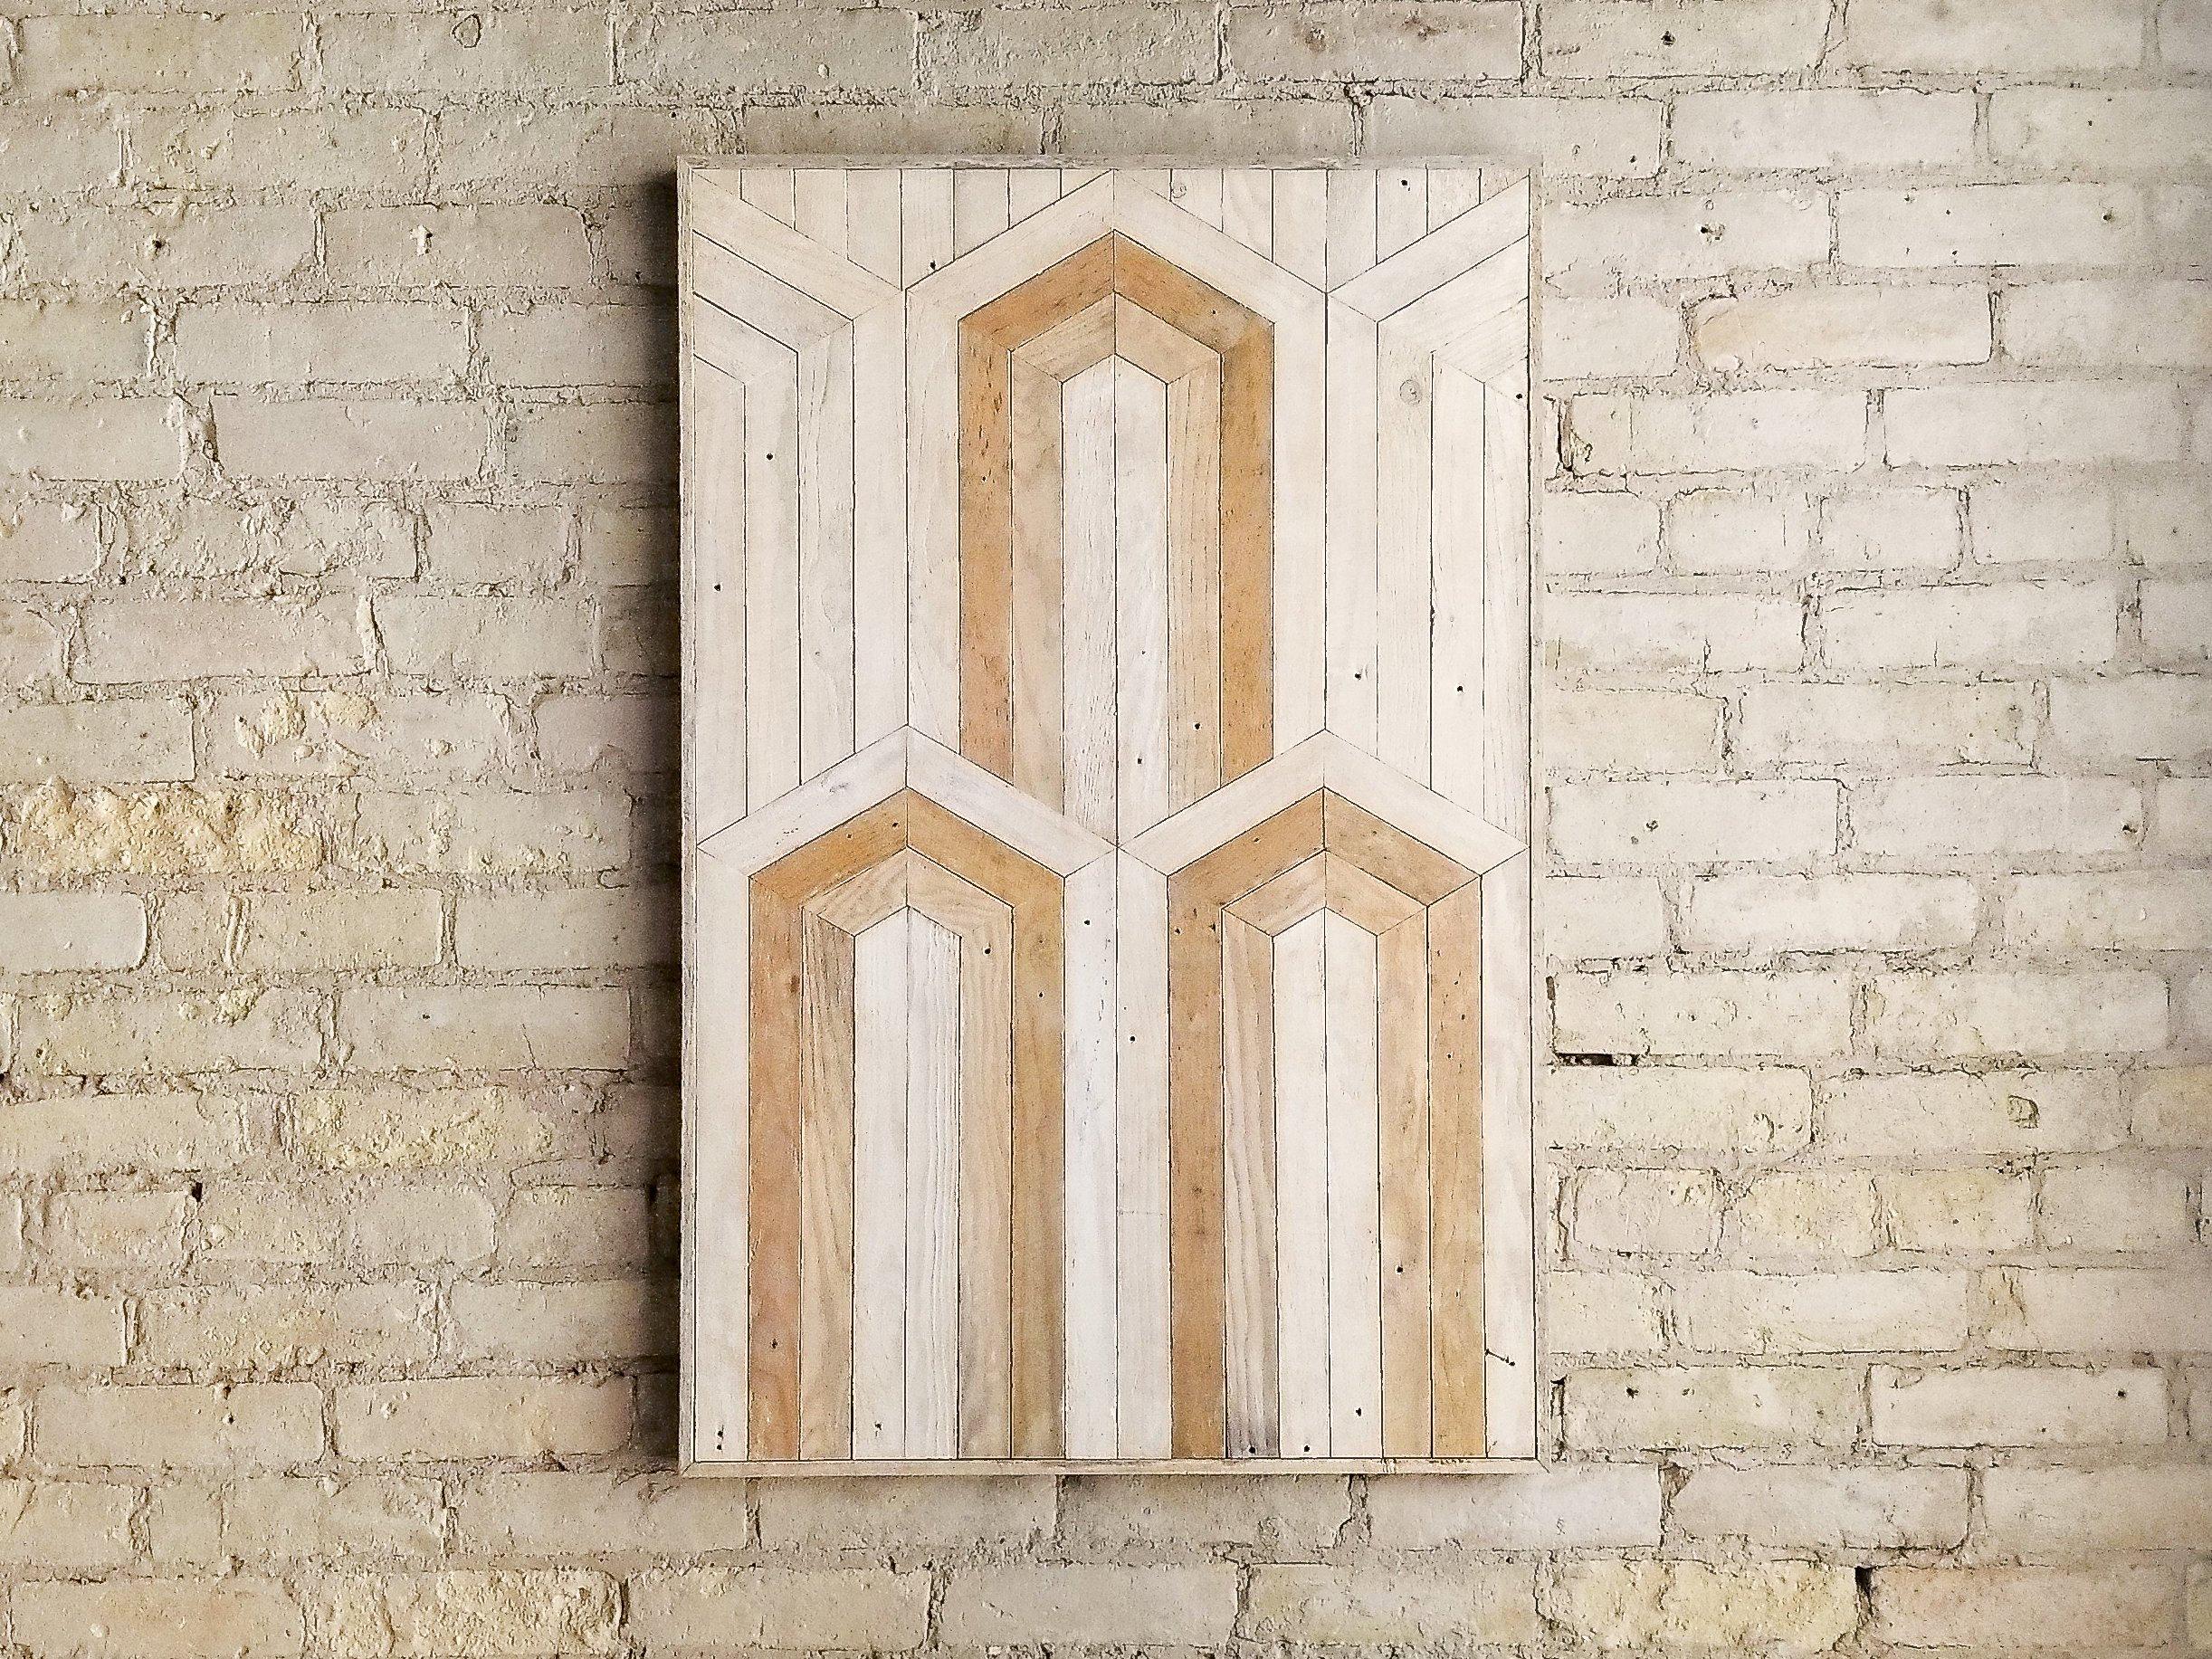 Reclaimed Wood Wall Art Wood Wall Art